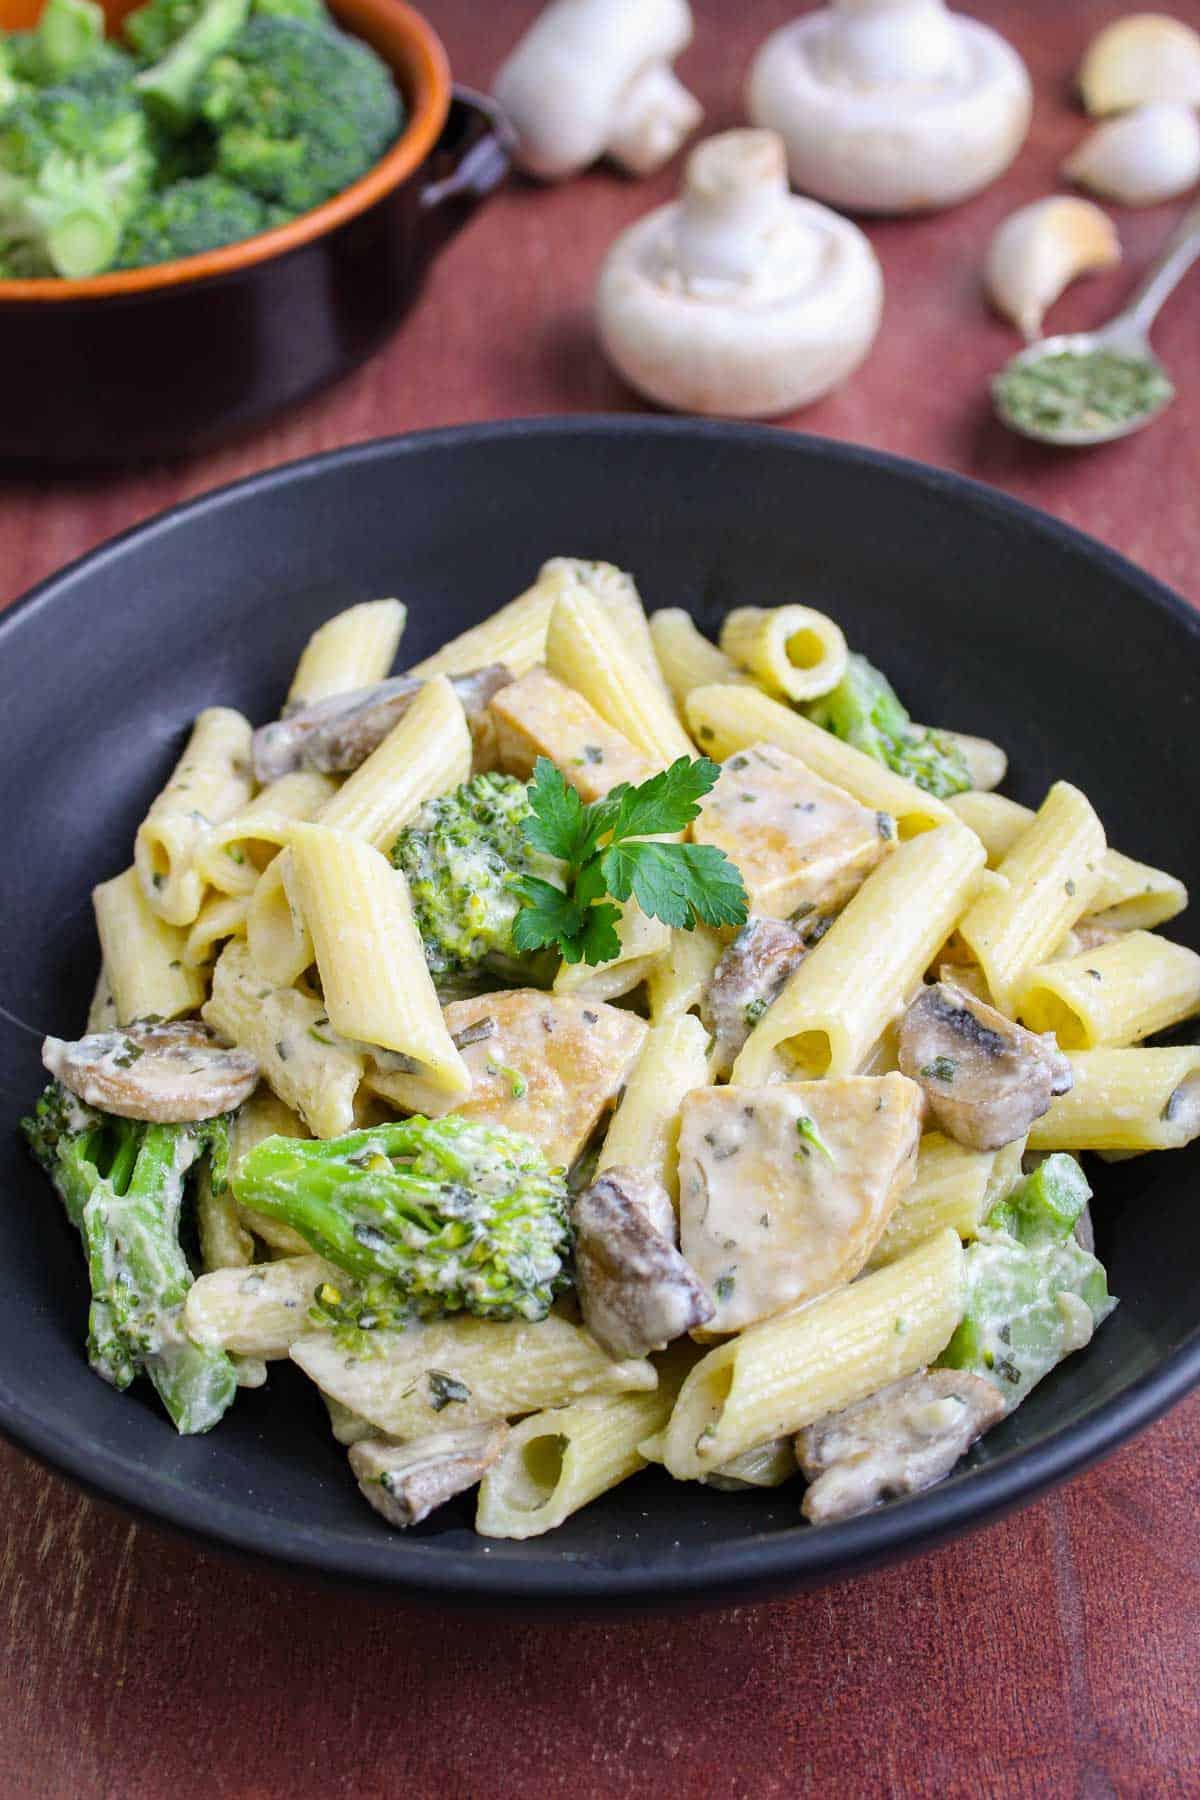 Bowl of Creamy Vegan Pasta with Tempeh, Broccoli, and Mushrooms